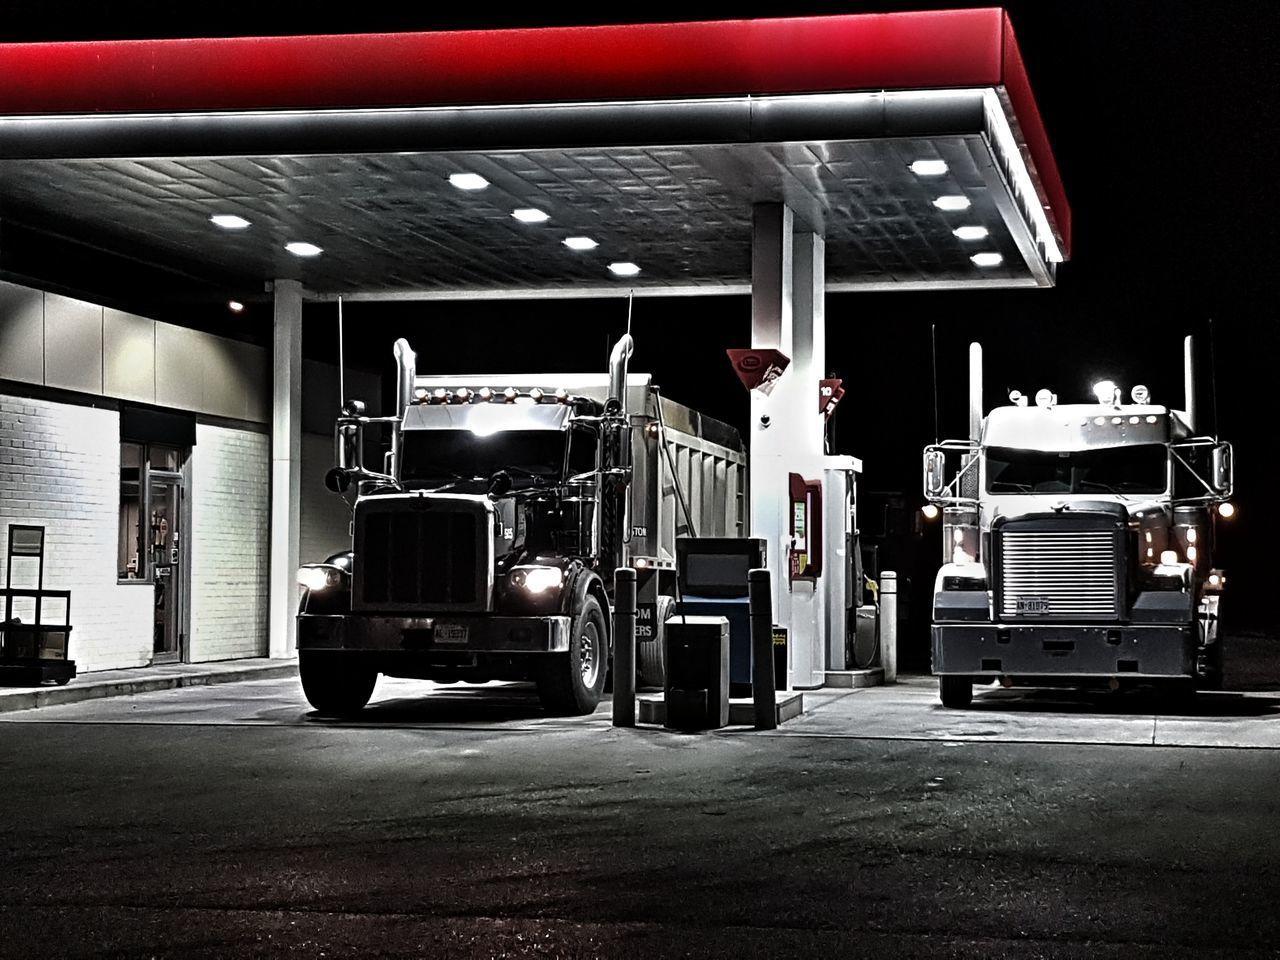 401 Alone Gas Station At Night Toronto Working Architecture City Dump Truck Hiway Hiway 401 Illuminated Night Refueling Transportation Trucks